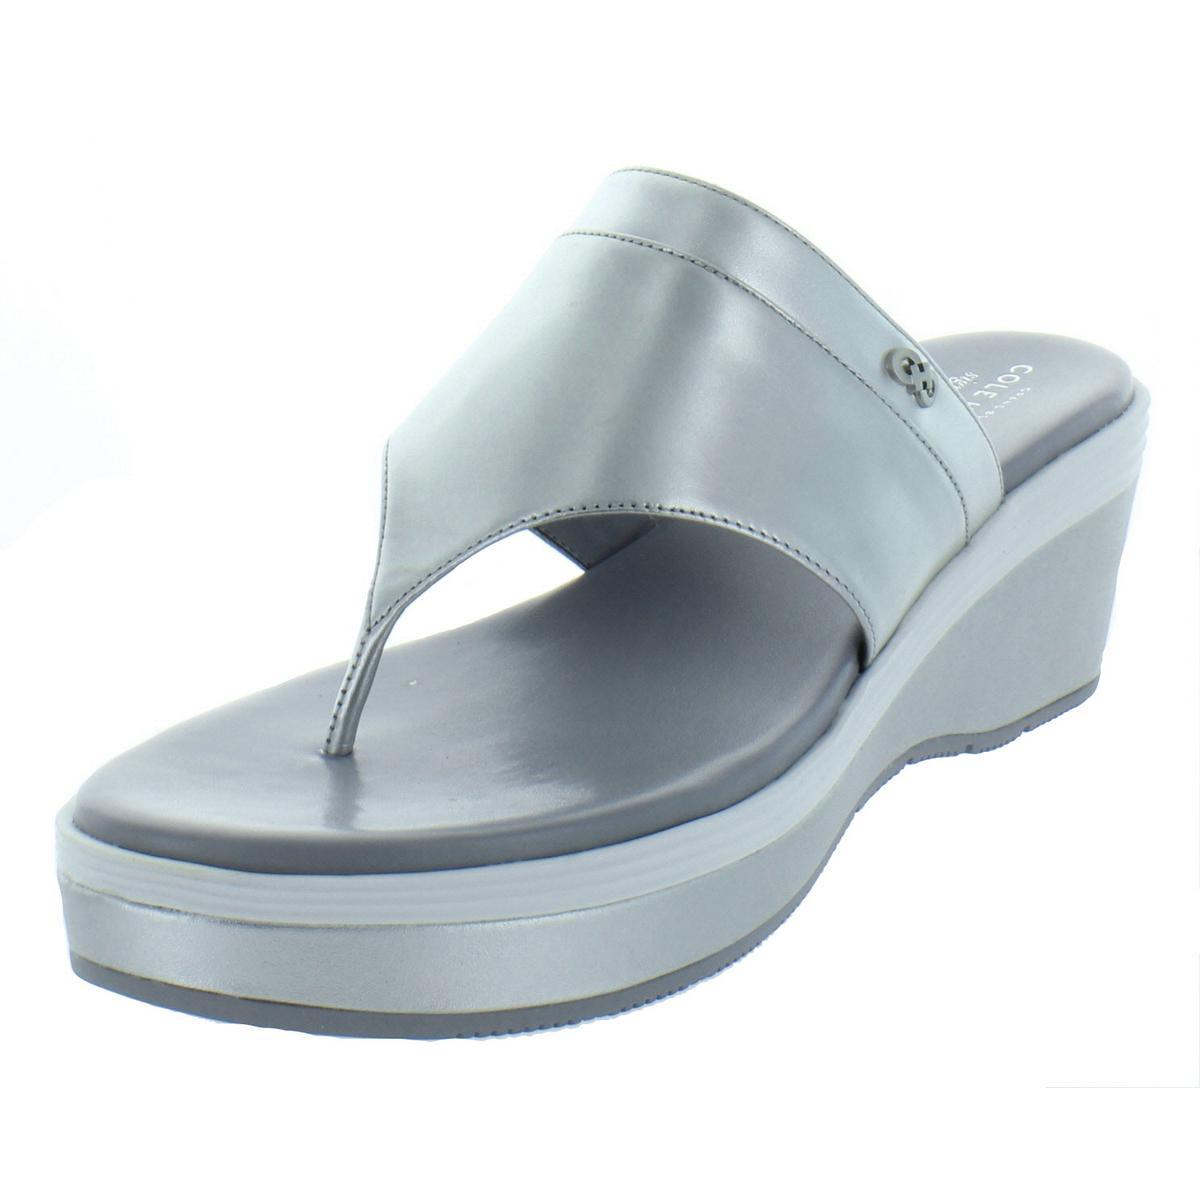 a168afa6d Details about Cole Haan Womens Cecily Grand Silver Thong Sandals 9.5 Medium  (B,M) BHFO 6362